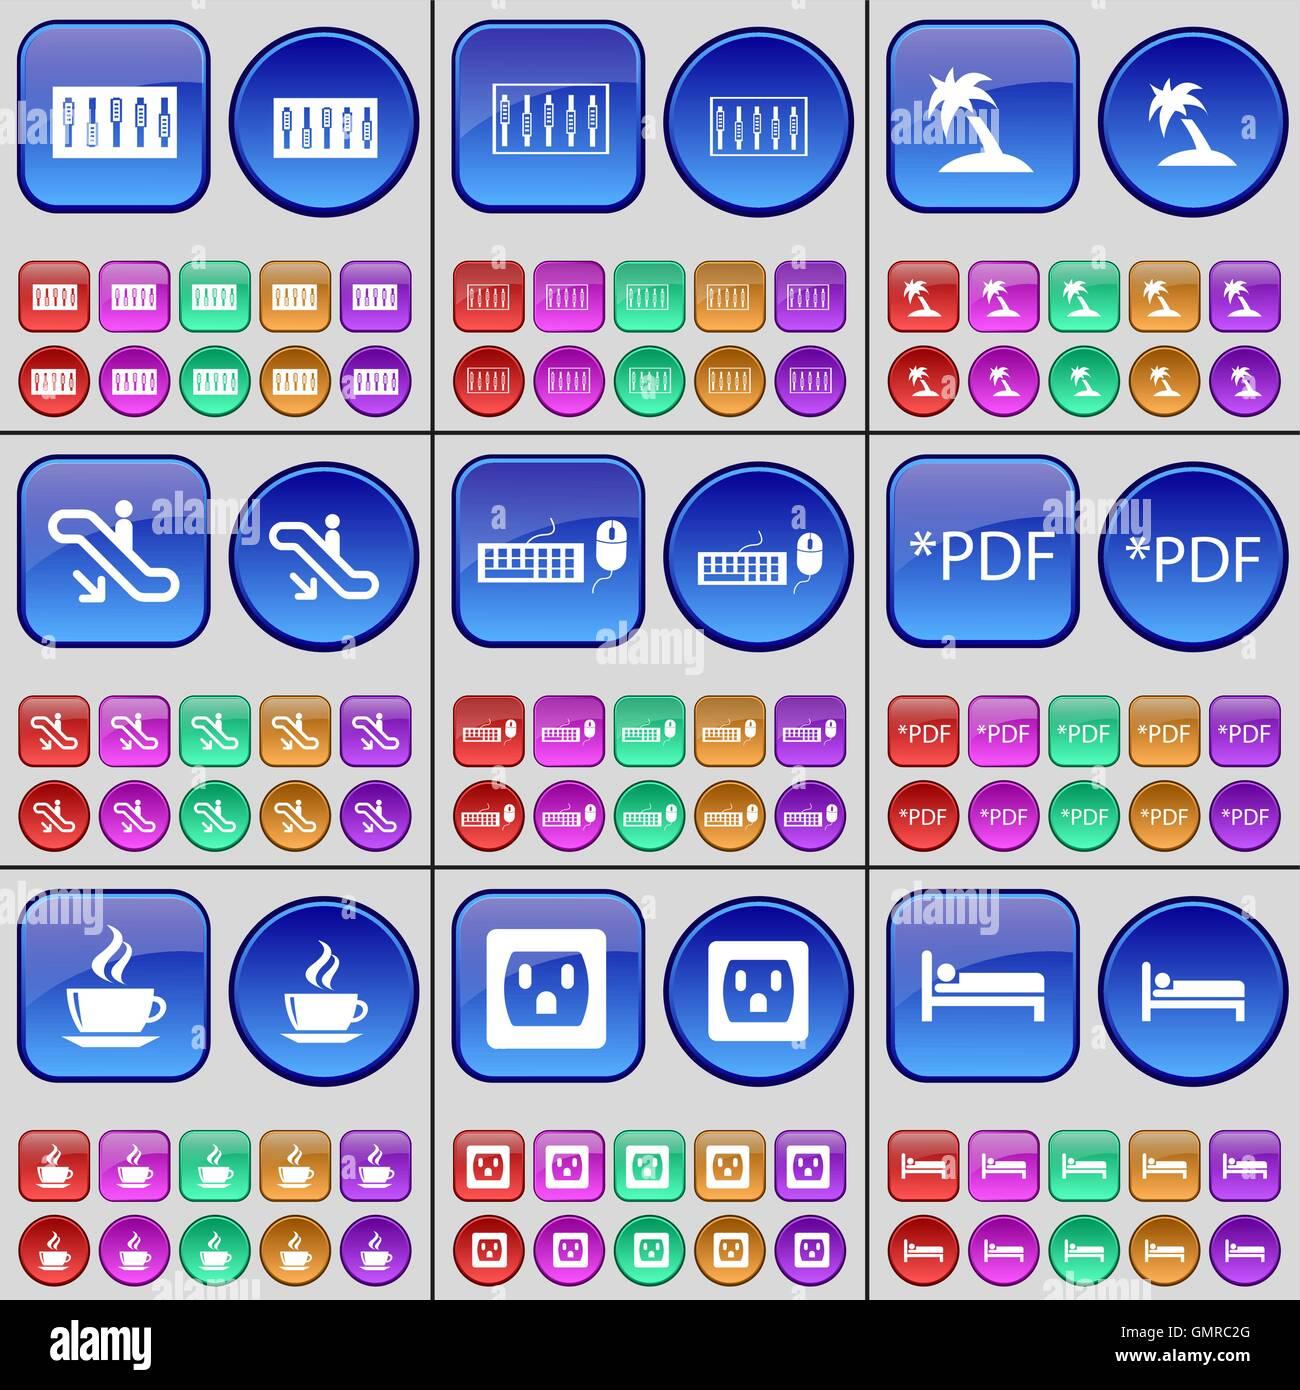 Equalizer, Palm, Rolltreppe, Tastatur, PDF, Kaffee, Steckdose, Bett ...